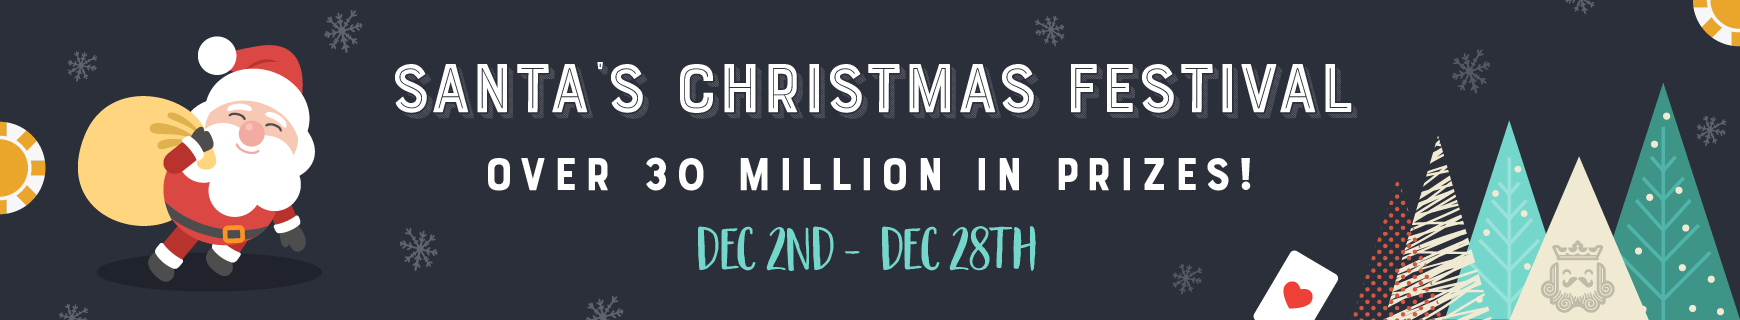 Santa's christmas festival 2018correct %28870 x 160%29 2x %281%29